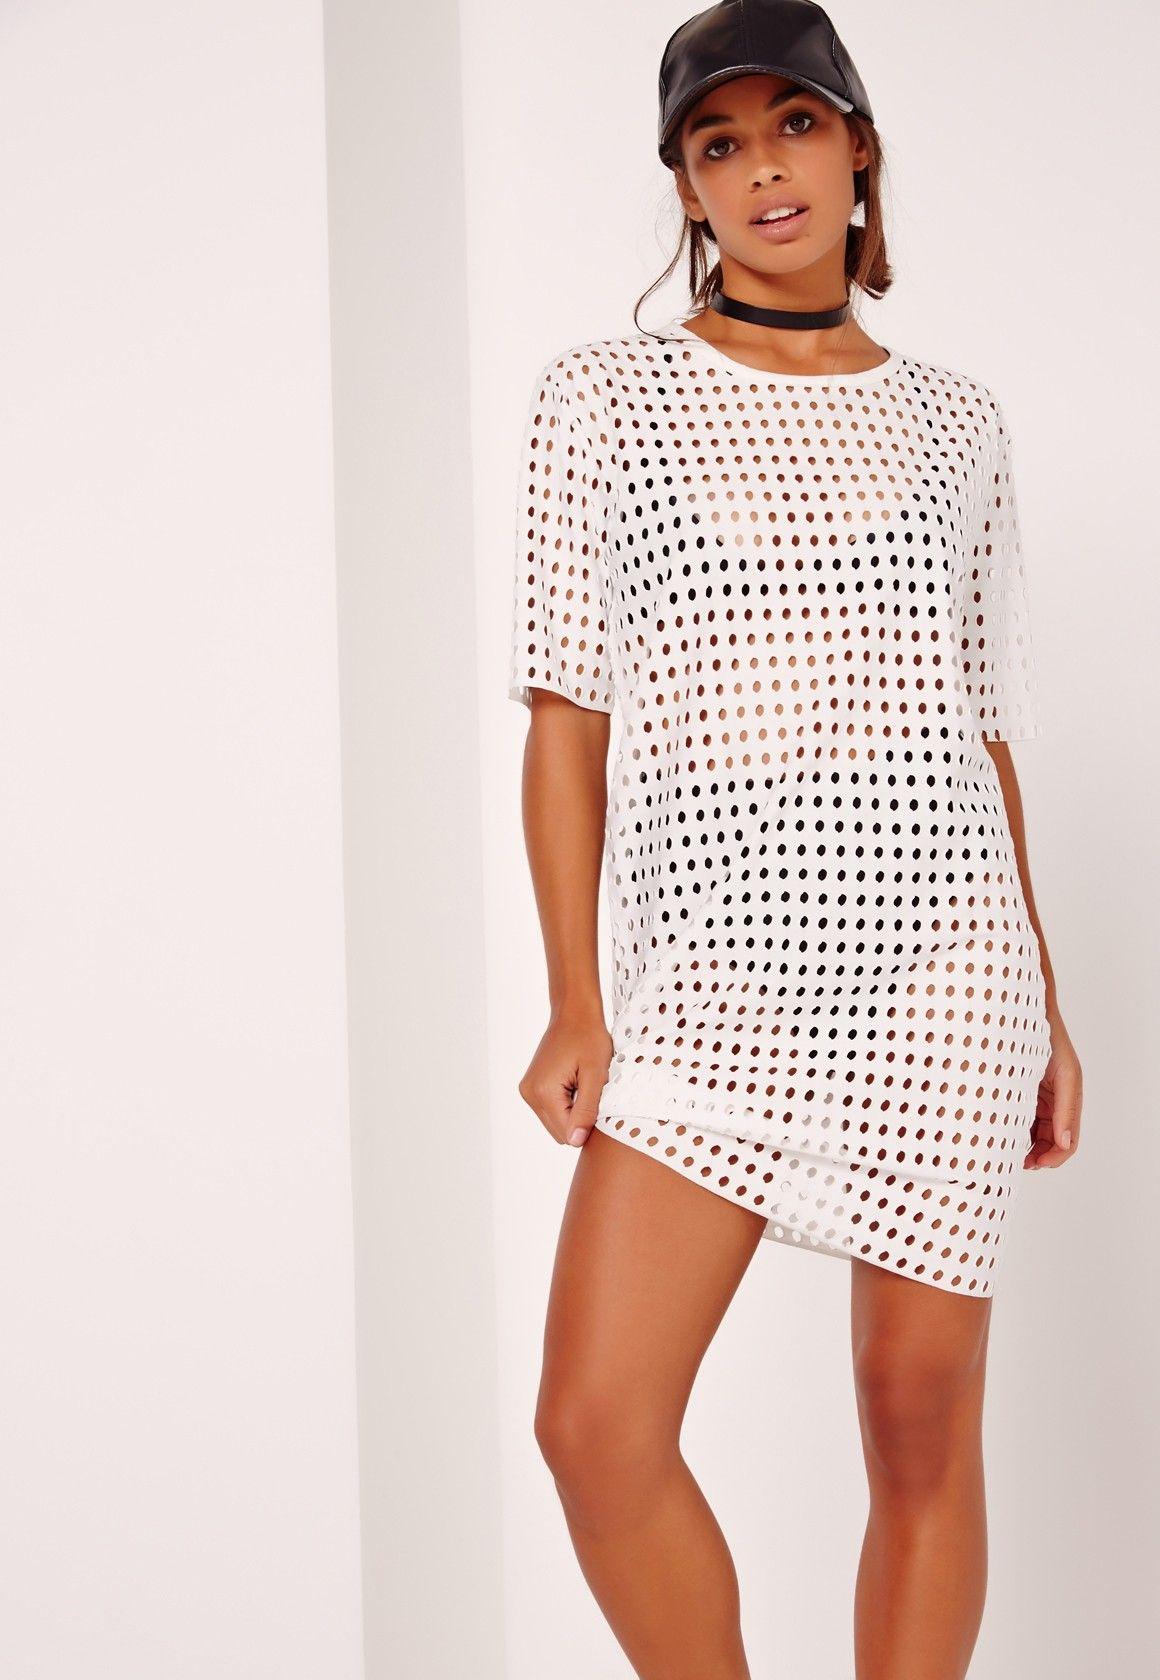 59253412ae4 Missguided - Fishnet T-Shirt Dress White